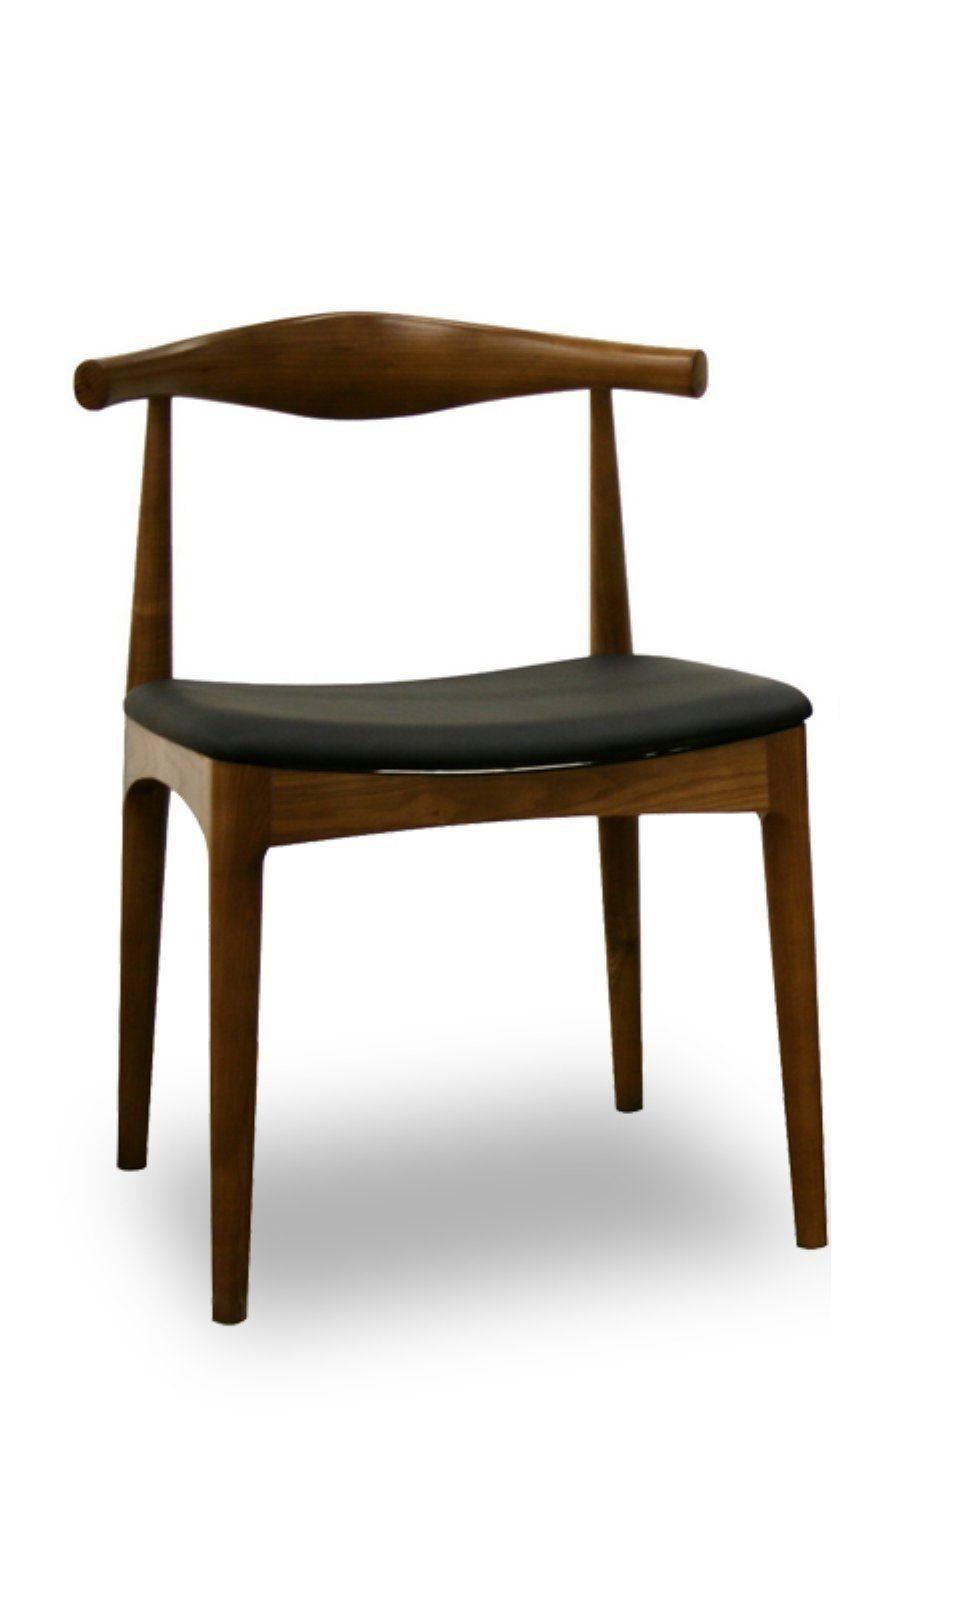 Hans Wegner Style, Arm  Chair, Mid Century Modern, Eames Era, Vintage, Retro,Contemporary